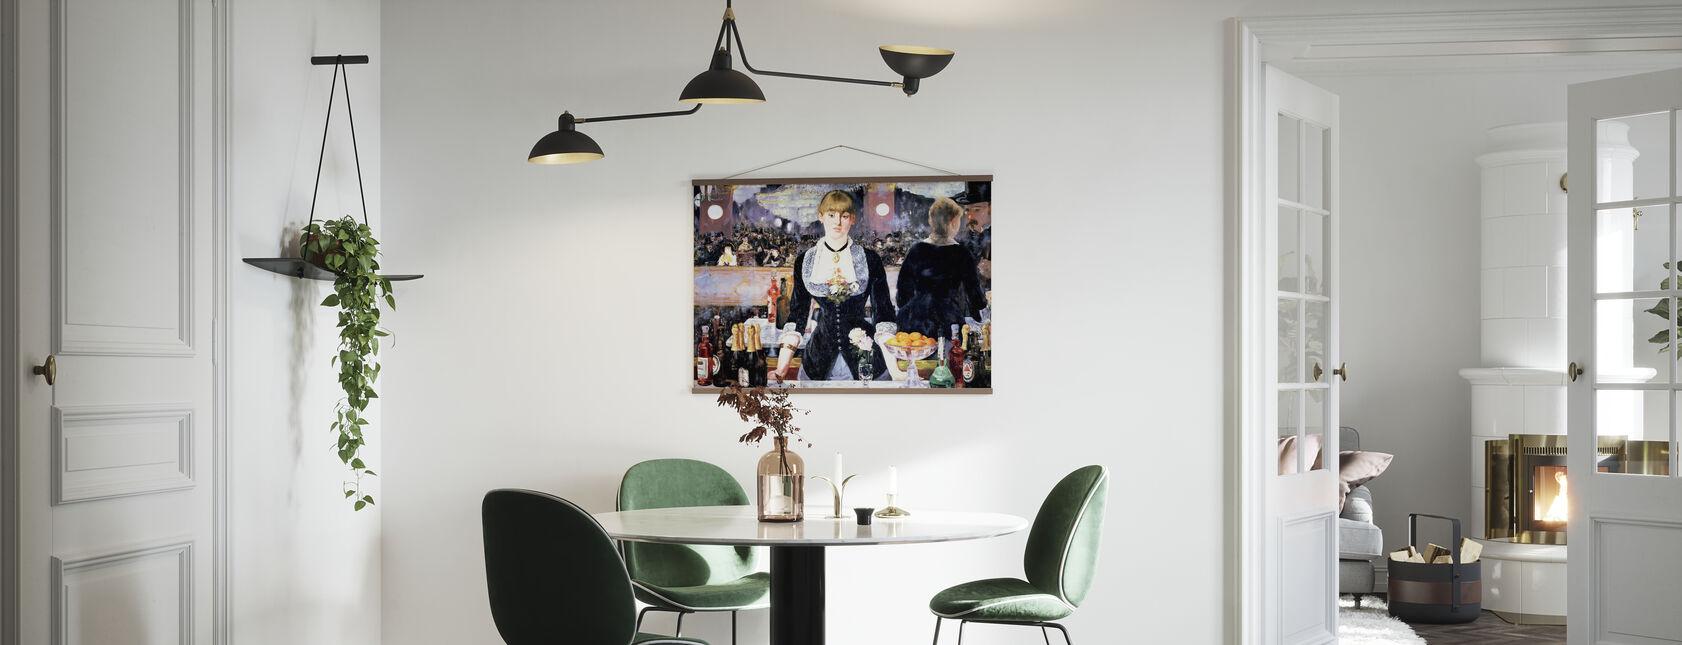 Bar at Folies-Bergere, Edouard Manet - Poster - Kitchen